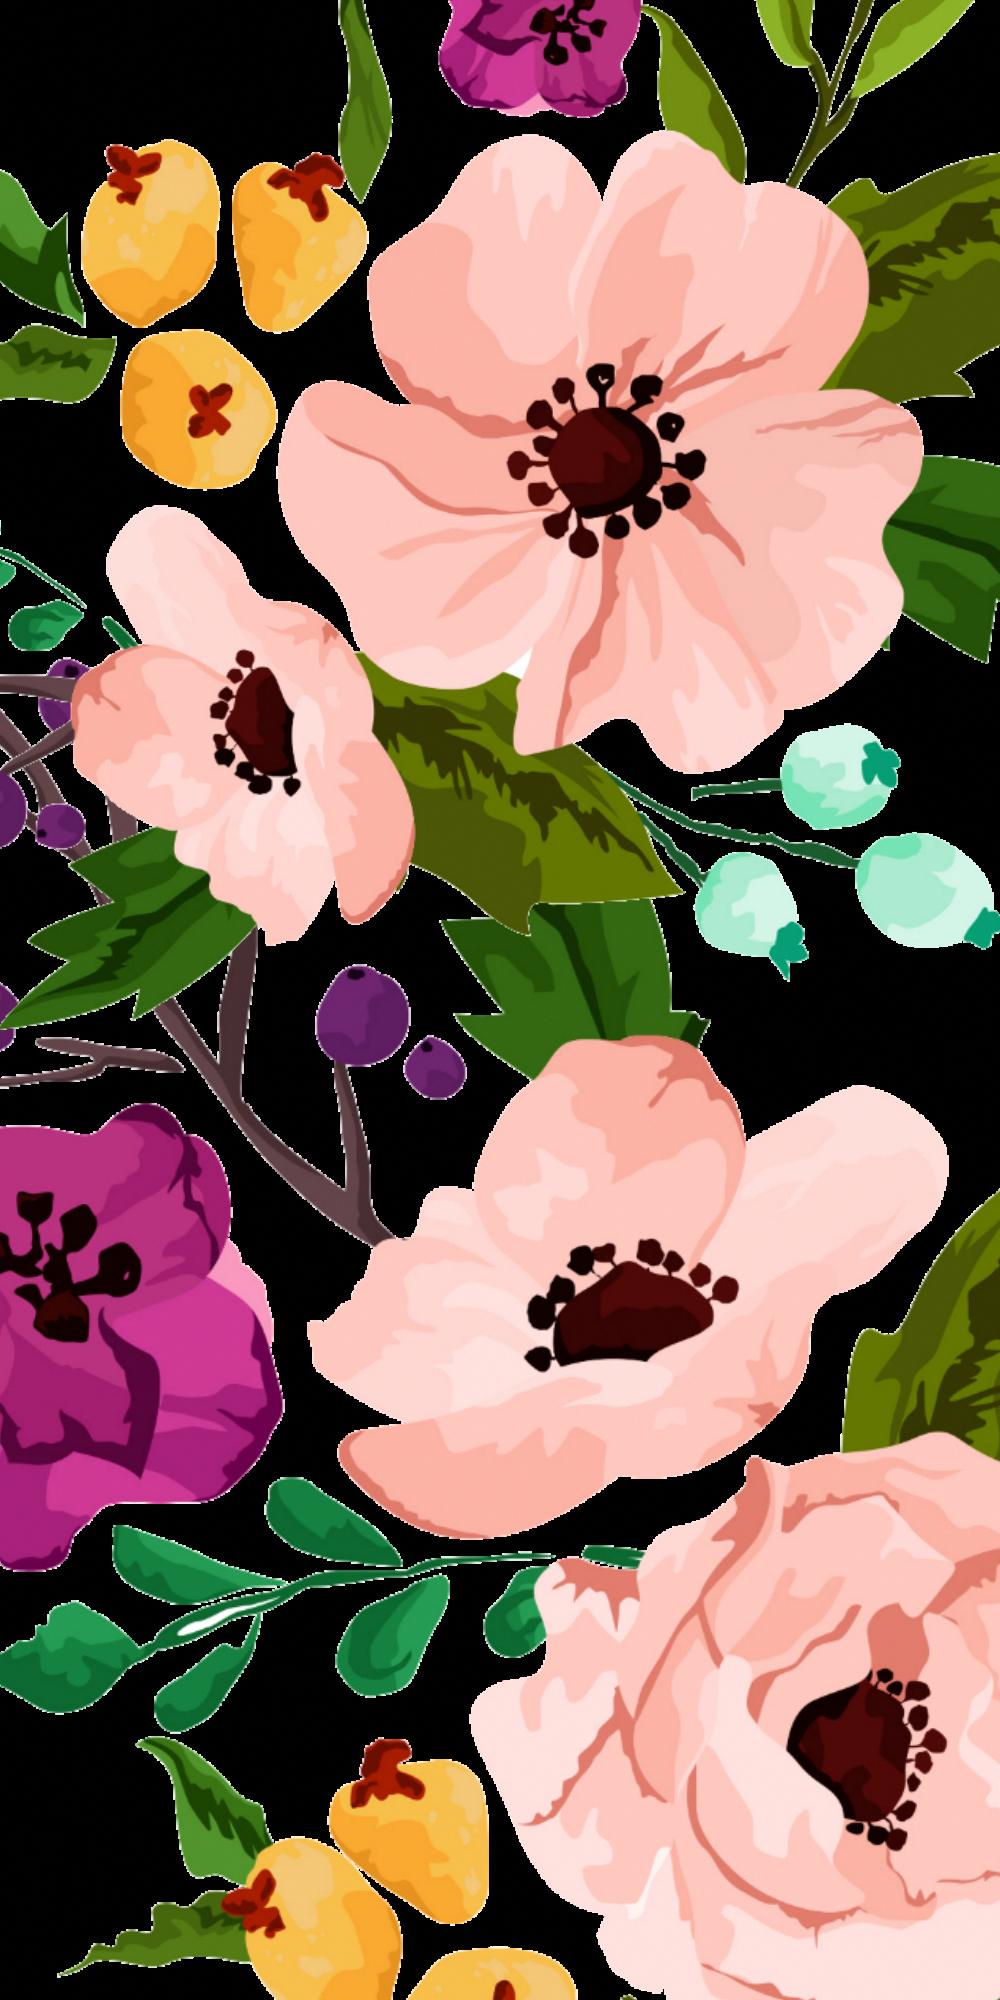 Flowerslovers Hashtag Instagram Posts Videos Stories On Instawebviewer Com Floral Wallpaper Floral Wallpaper Iphone Print Wallpaper